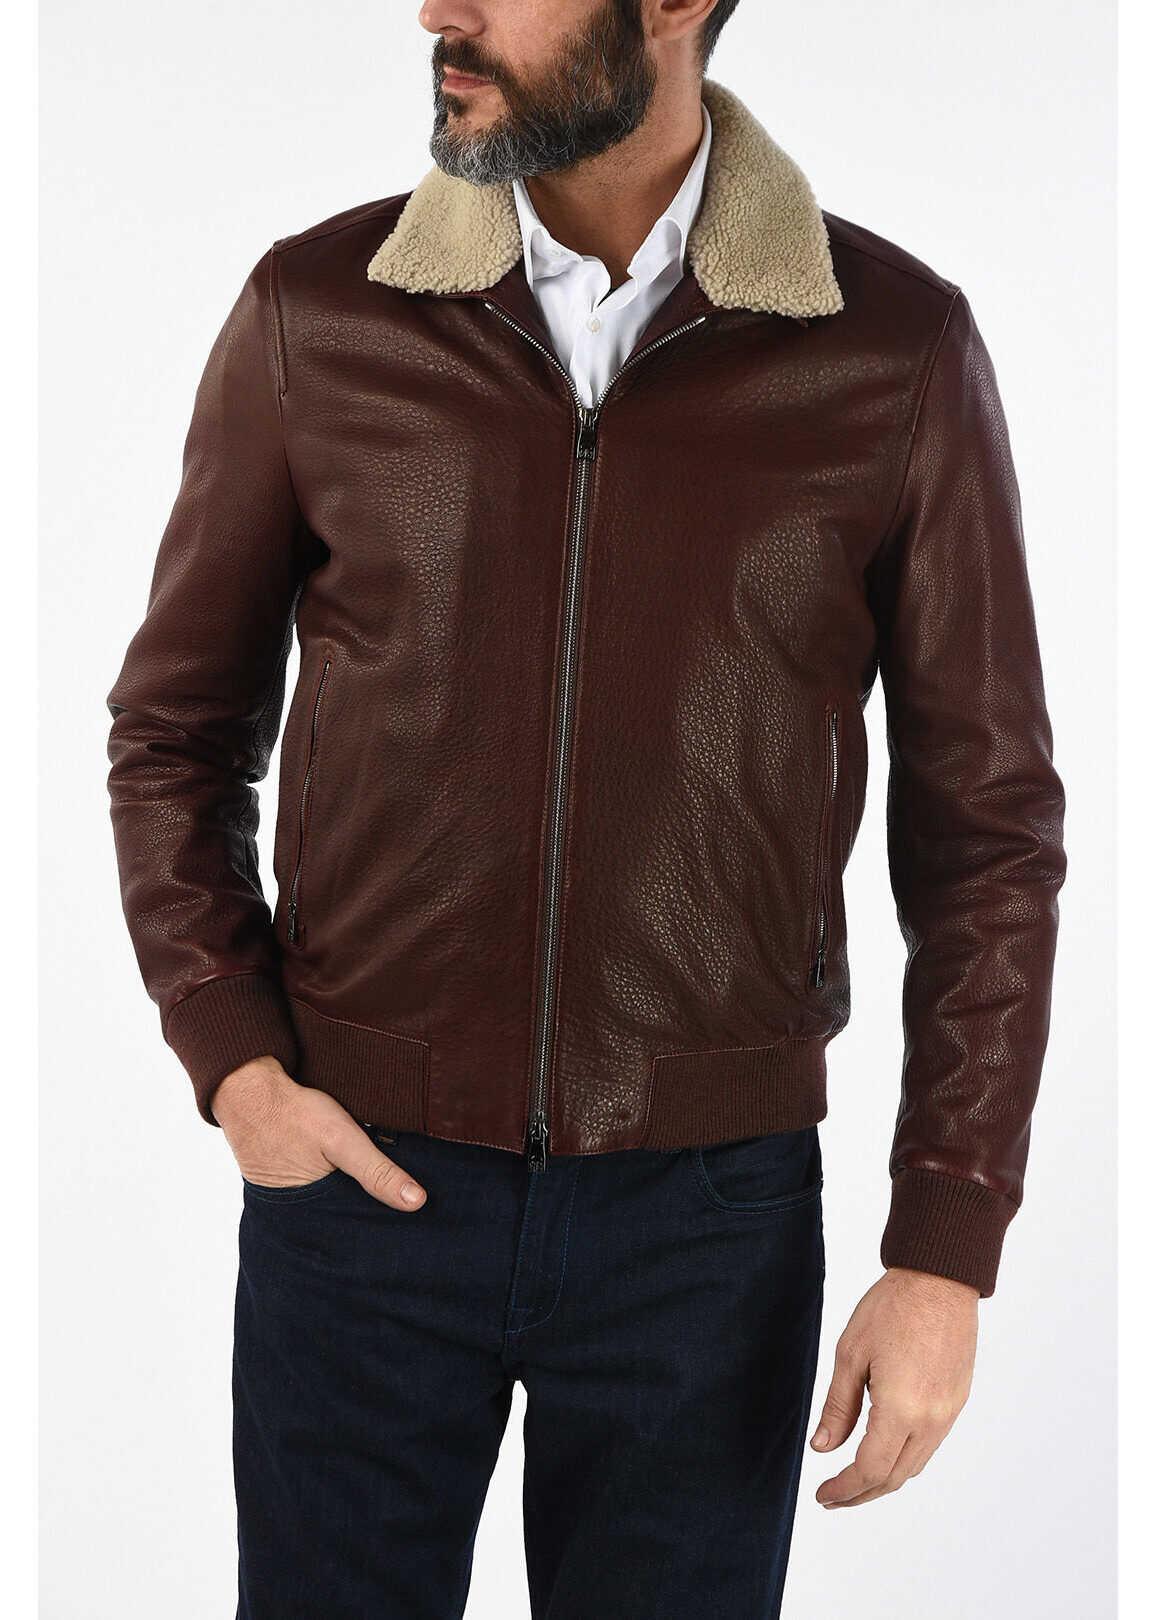 CORNELIANI ID leather flight jacket BURGUNDY imagine